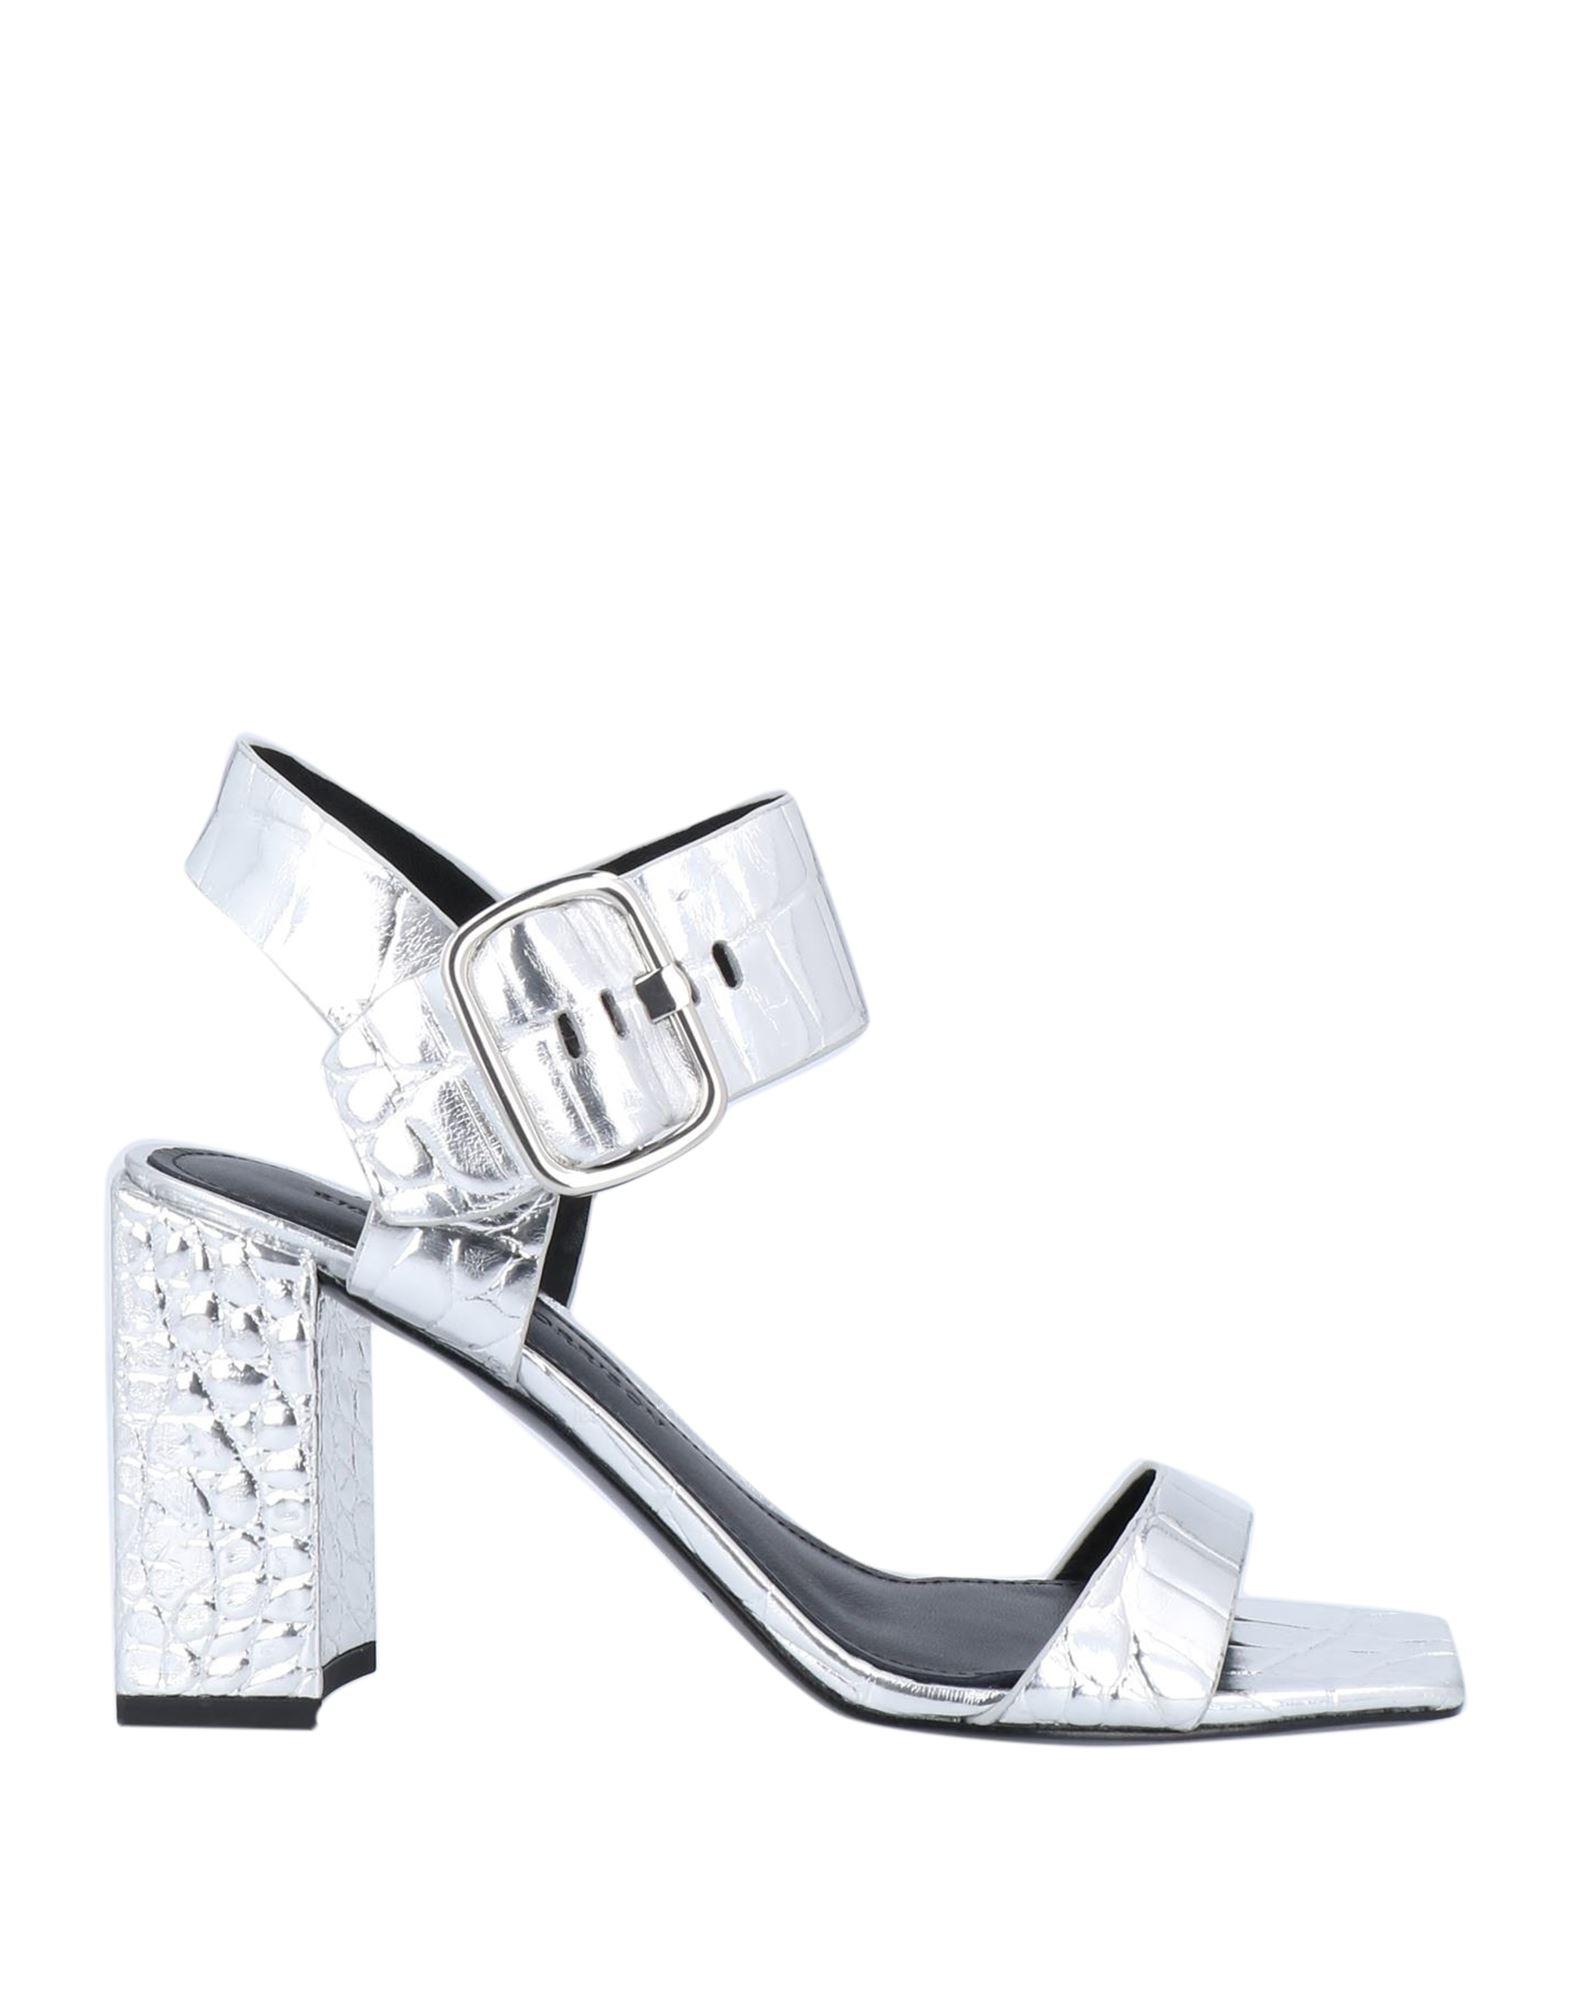 SIGERSON MORRISON Sandals - Item 11974985